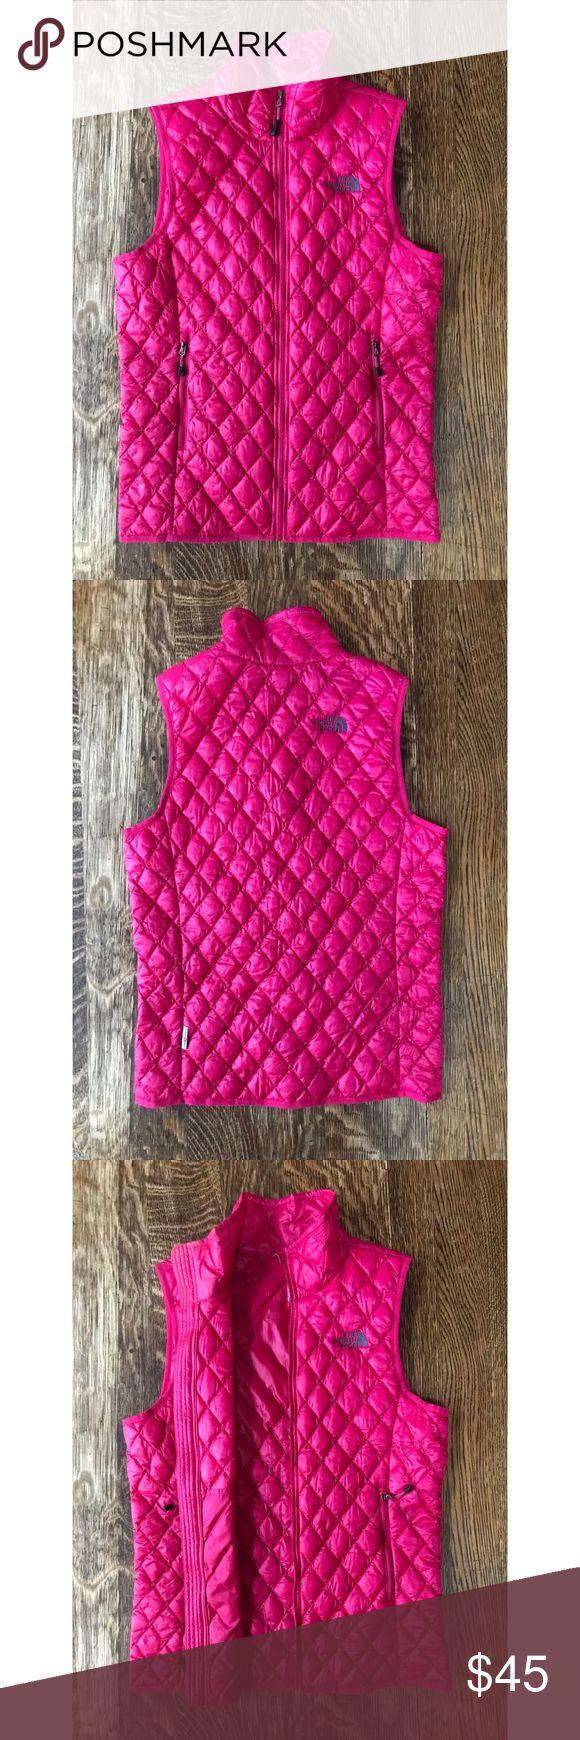 Ladies Petite North Face Vest Hot pink Ladies Nano puff Petite Vest.  Worn several times, no obvious wear! North Face Jackets & Coats Vests